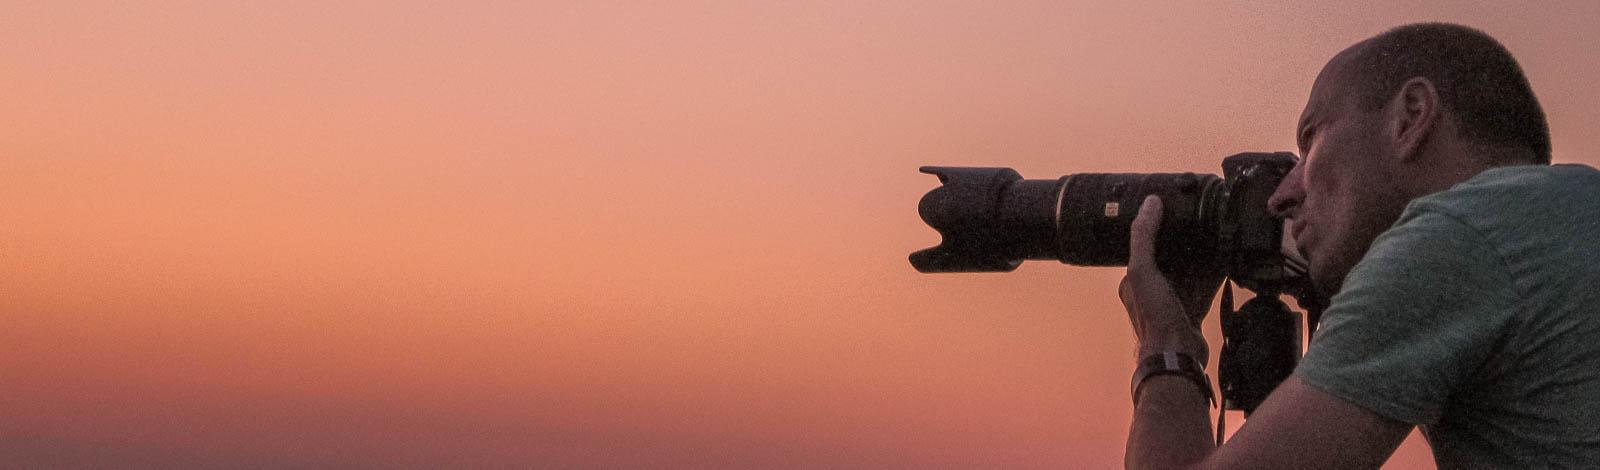 Tobias-Grimm-Ruhegebiet-Halden-Sonnenuntergang